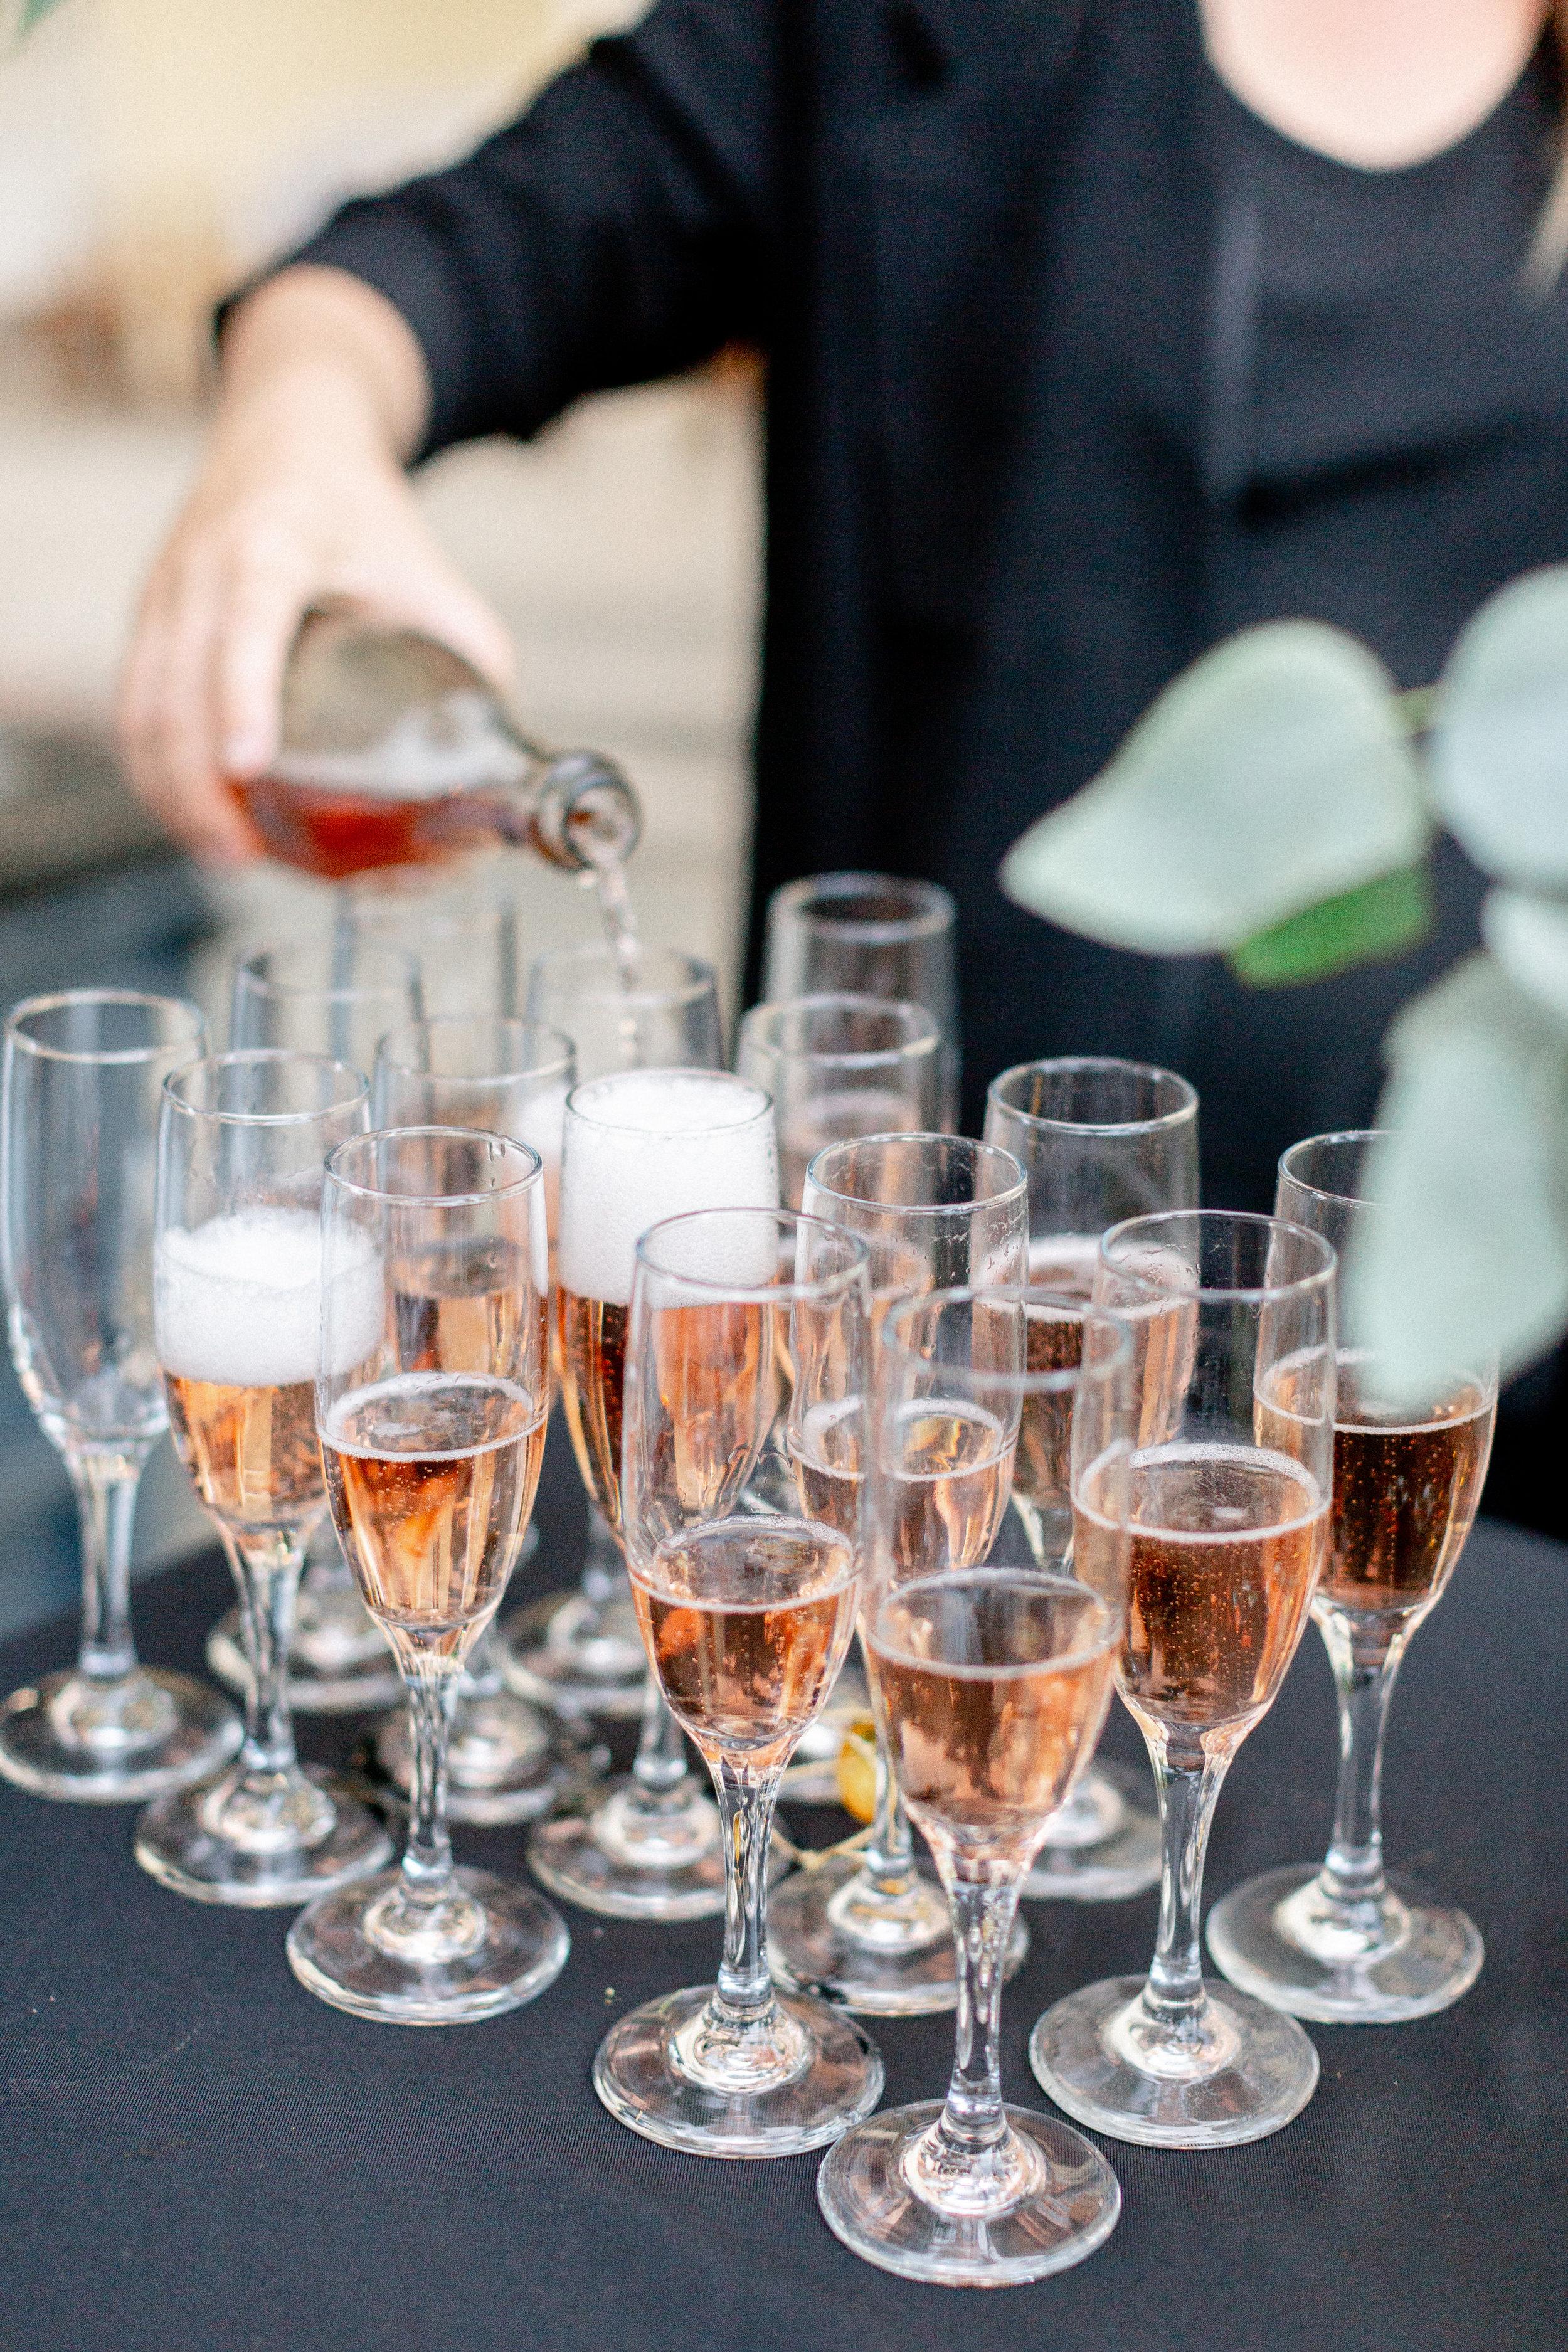 Picchetti-Winery-wedding-photos (129 of 145).jpg